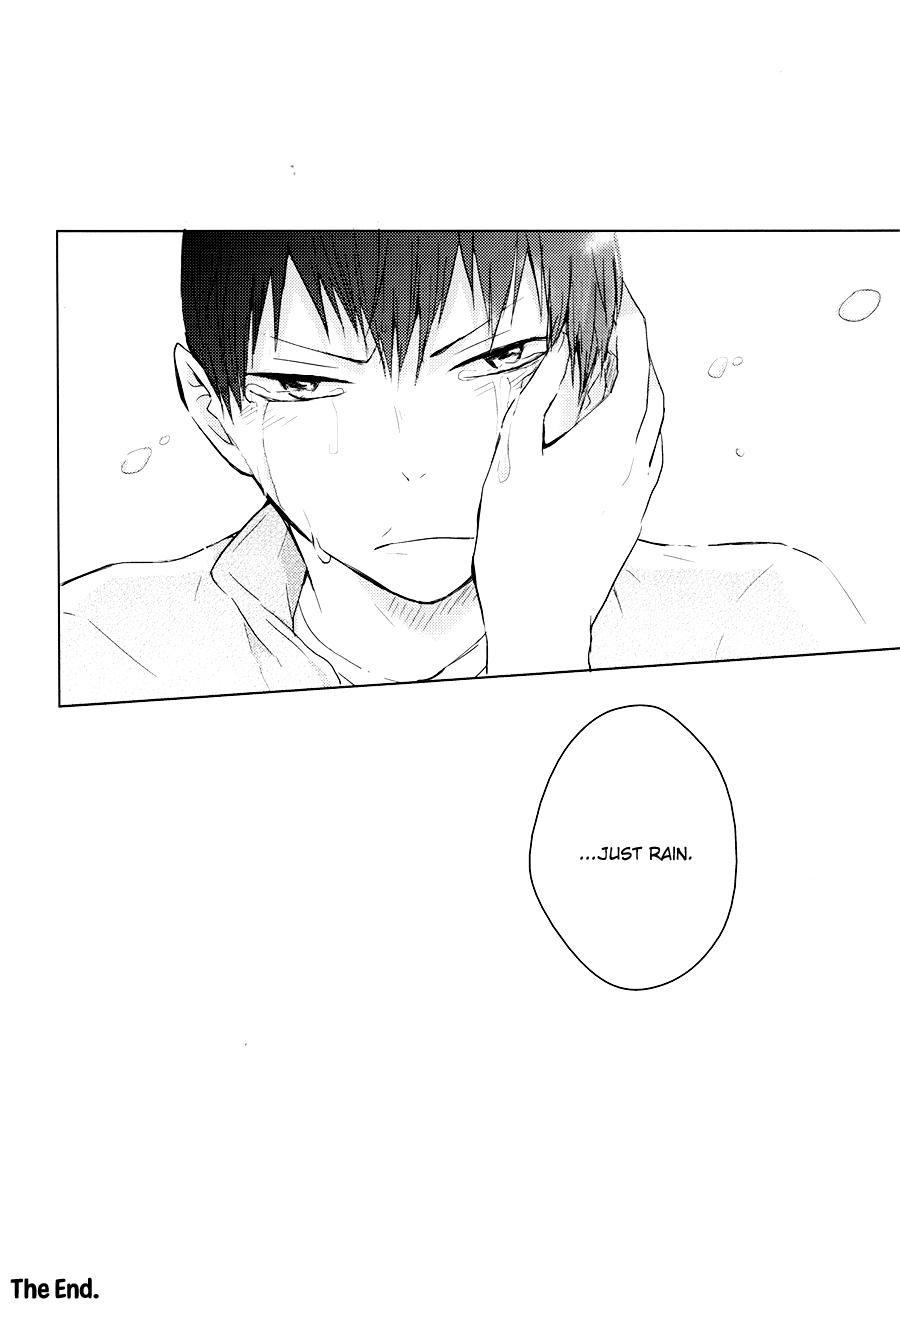 Haikyuu Kokoro Control Doujinshi Vol 2 Ch 0 Page 52 At Www Mangago Me Schwul P 51 Manga